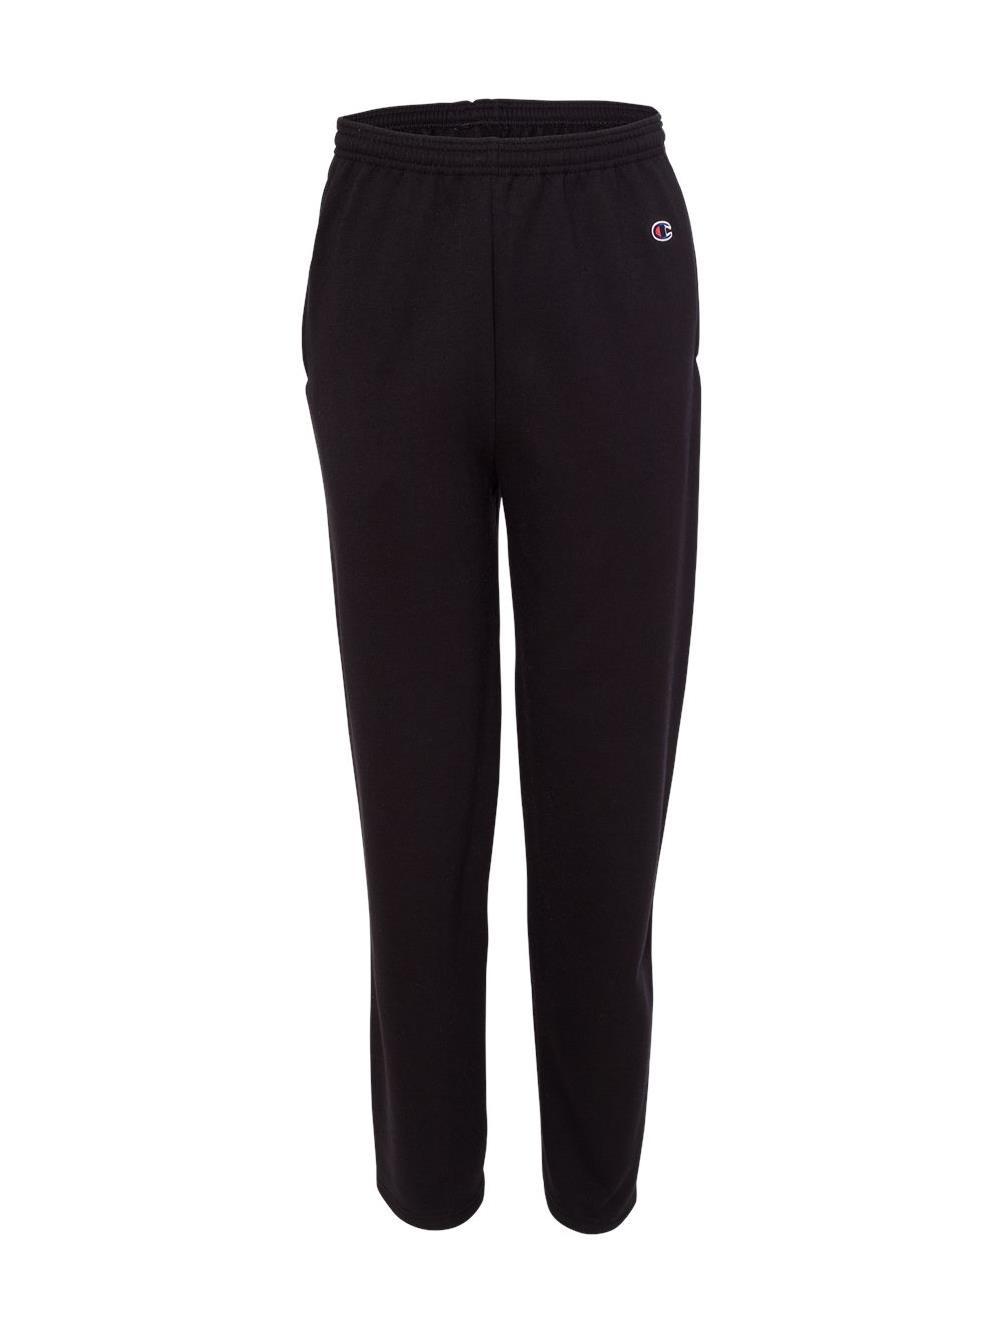 Champion Fleece Double Dry Eco Open Bottom Sweatpants with Pockets P800